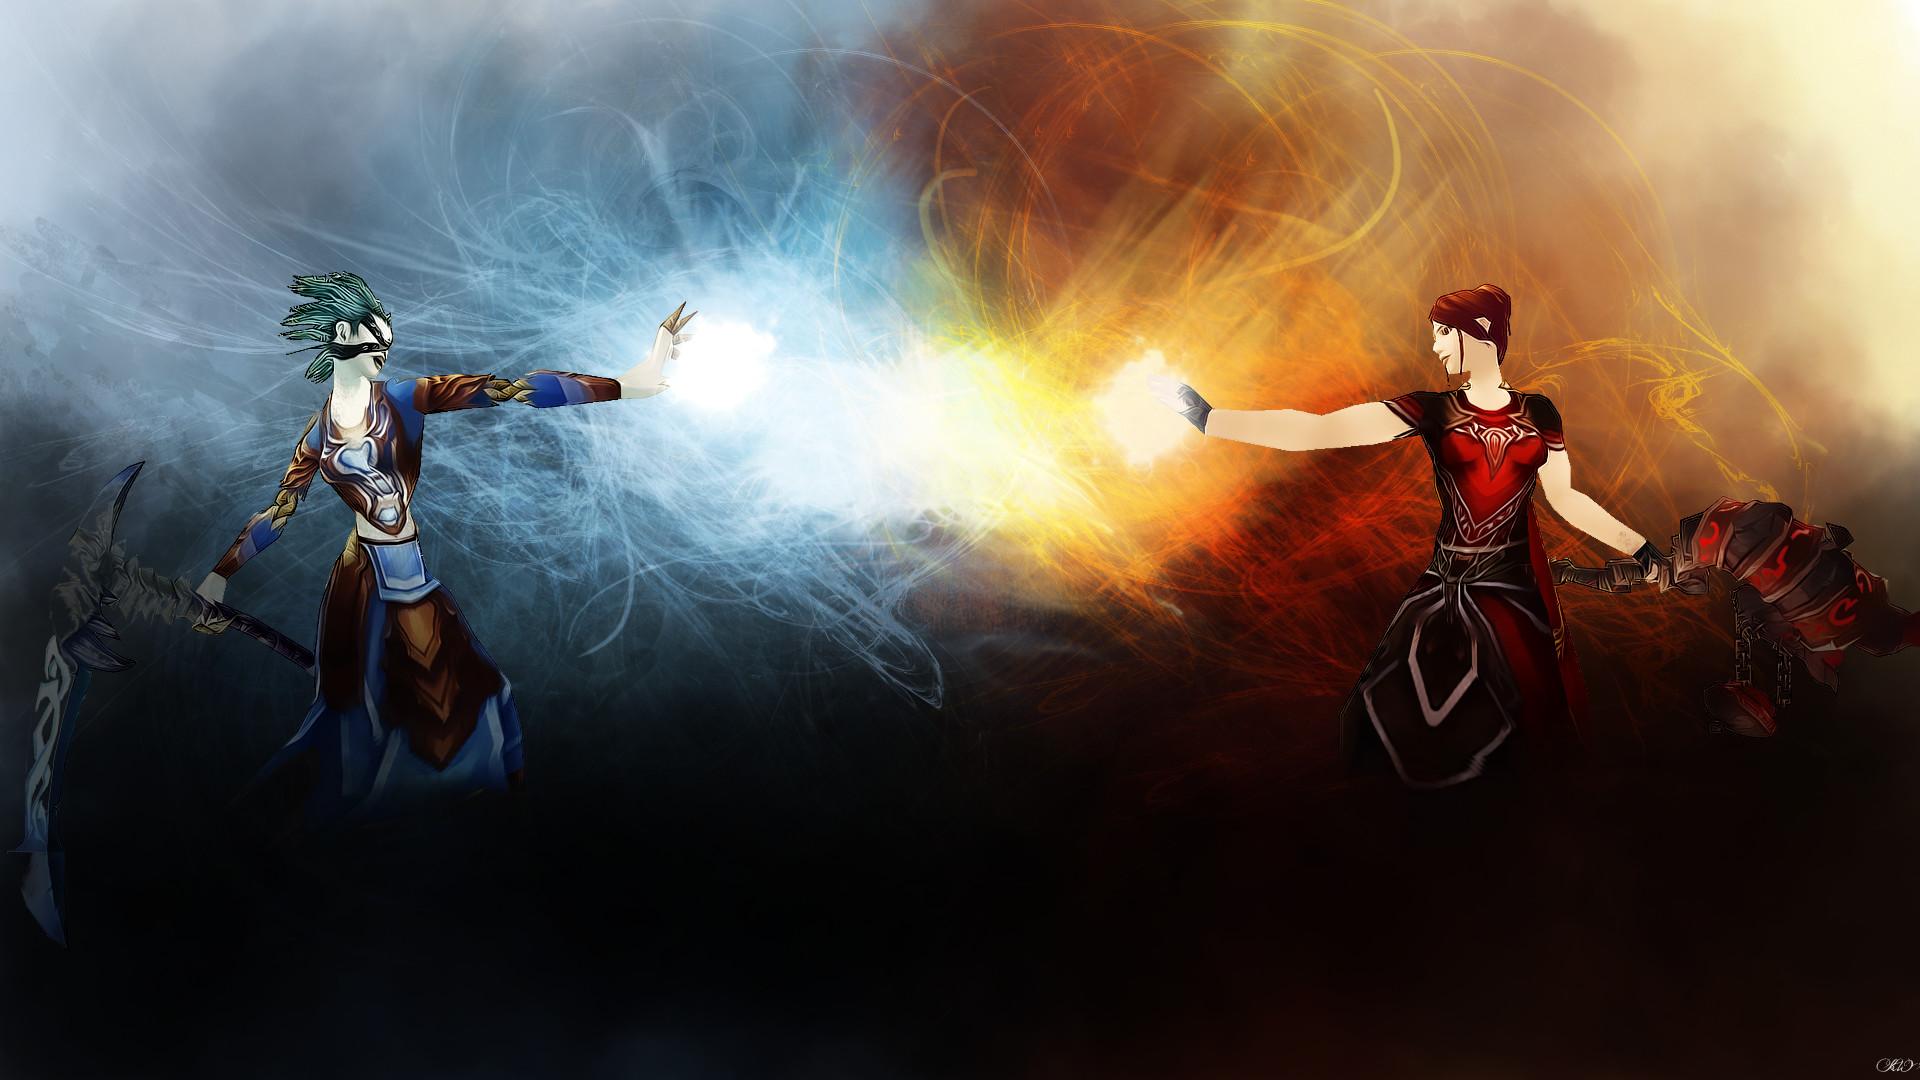 Frost VS Fire by Jaceyy Frost VS Fire by Jaceyy